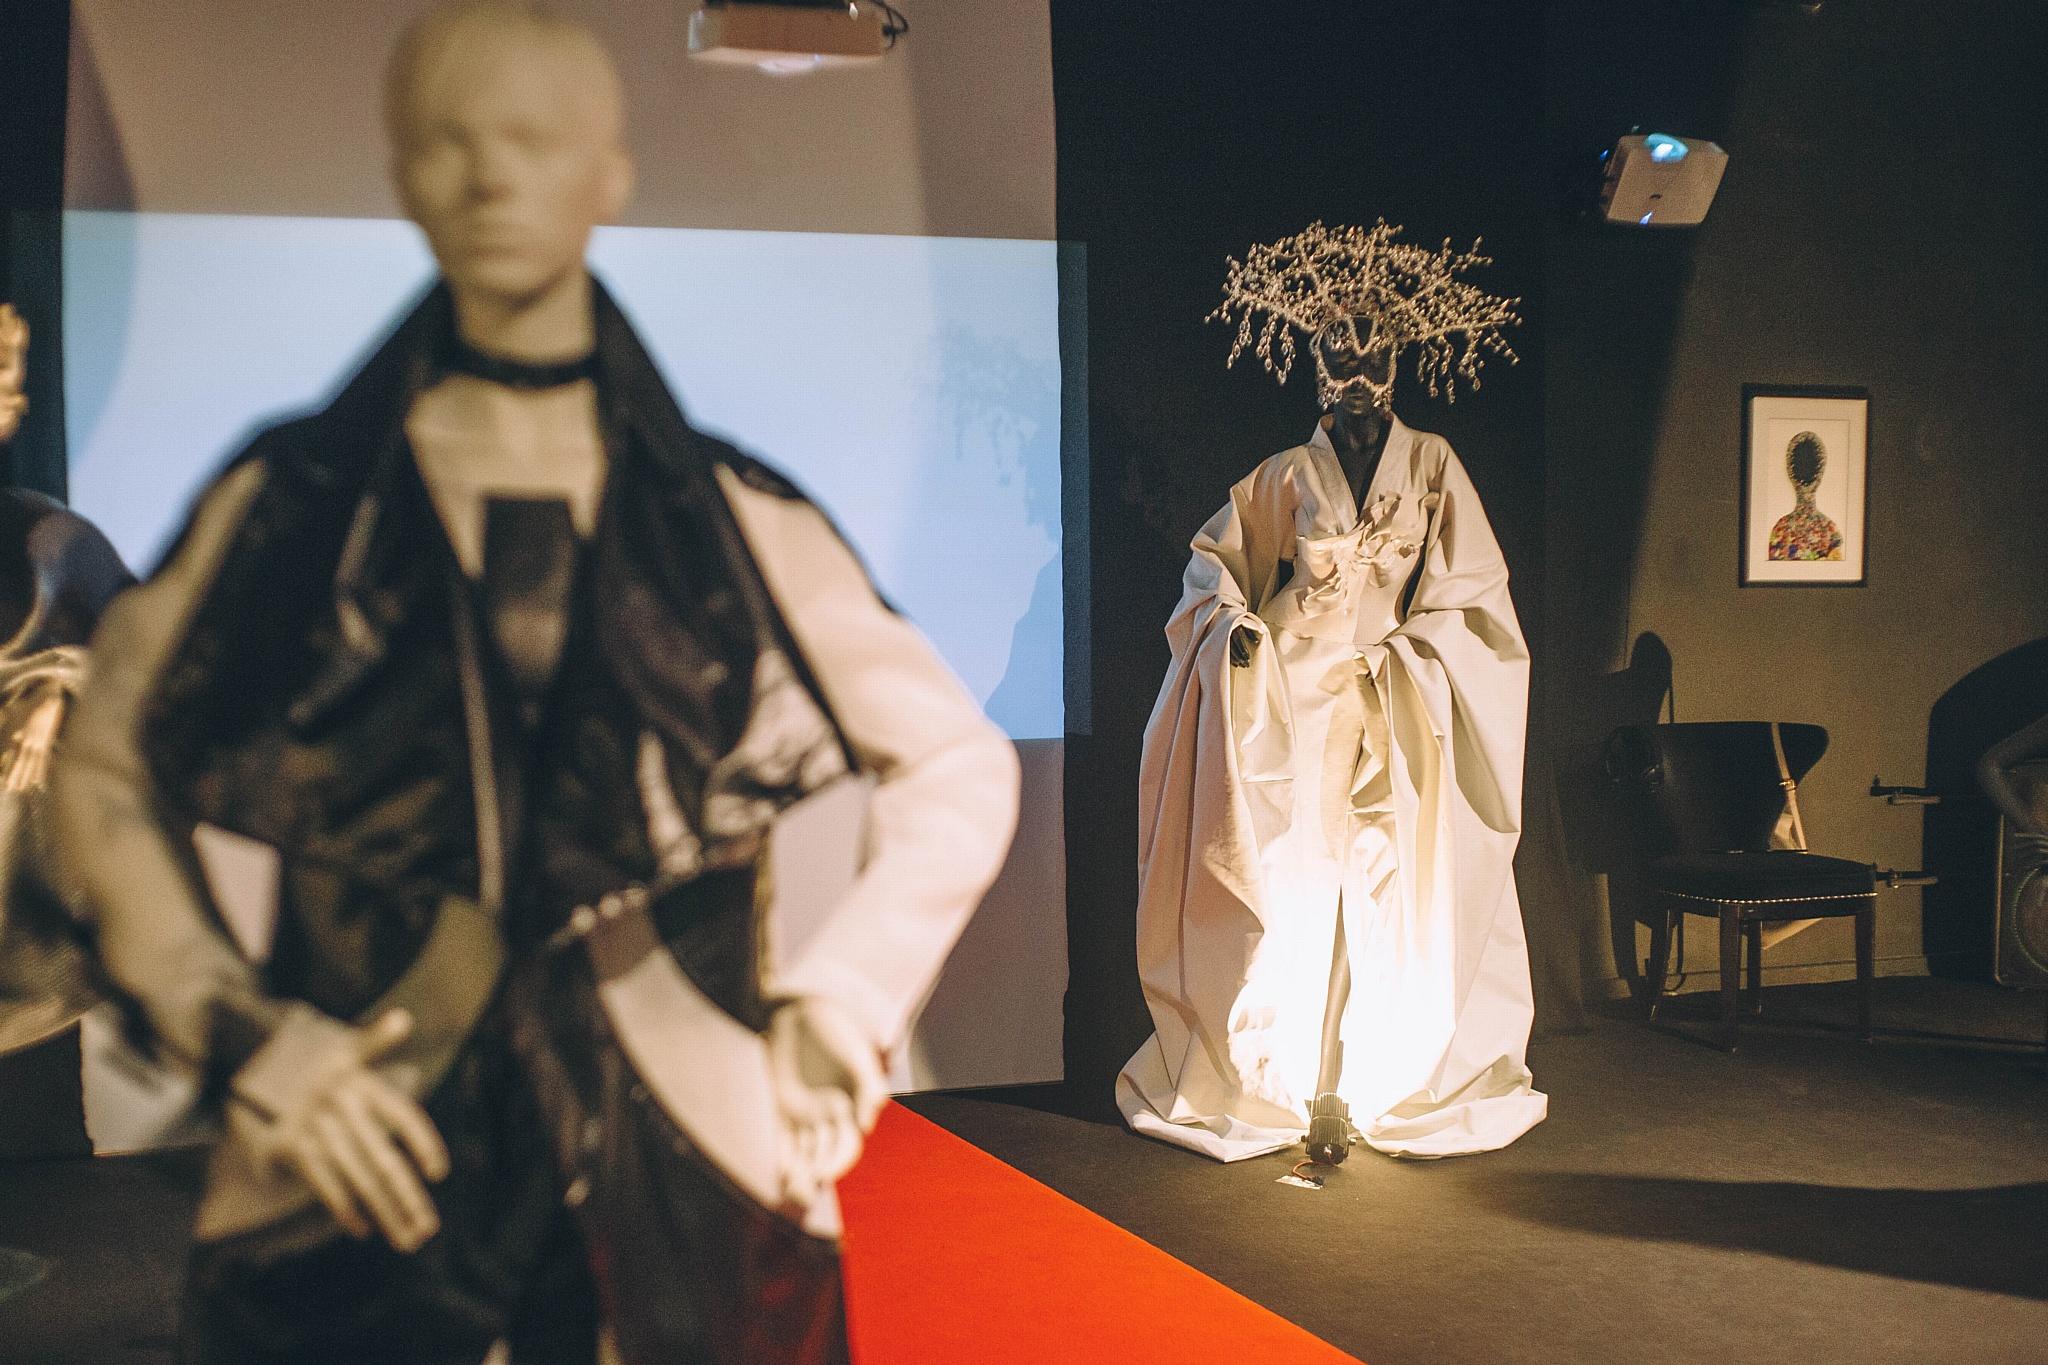 Участники Mercedes Benz Fashion Week Russia представили свои работы в ЦСИ Марс